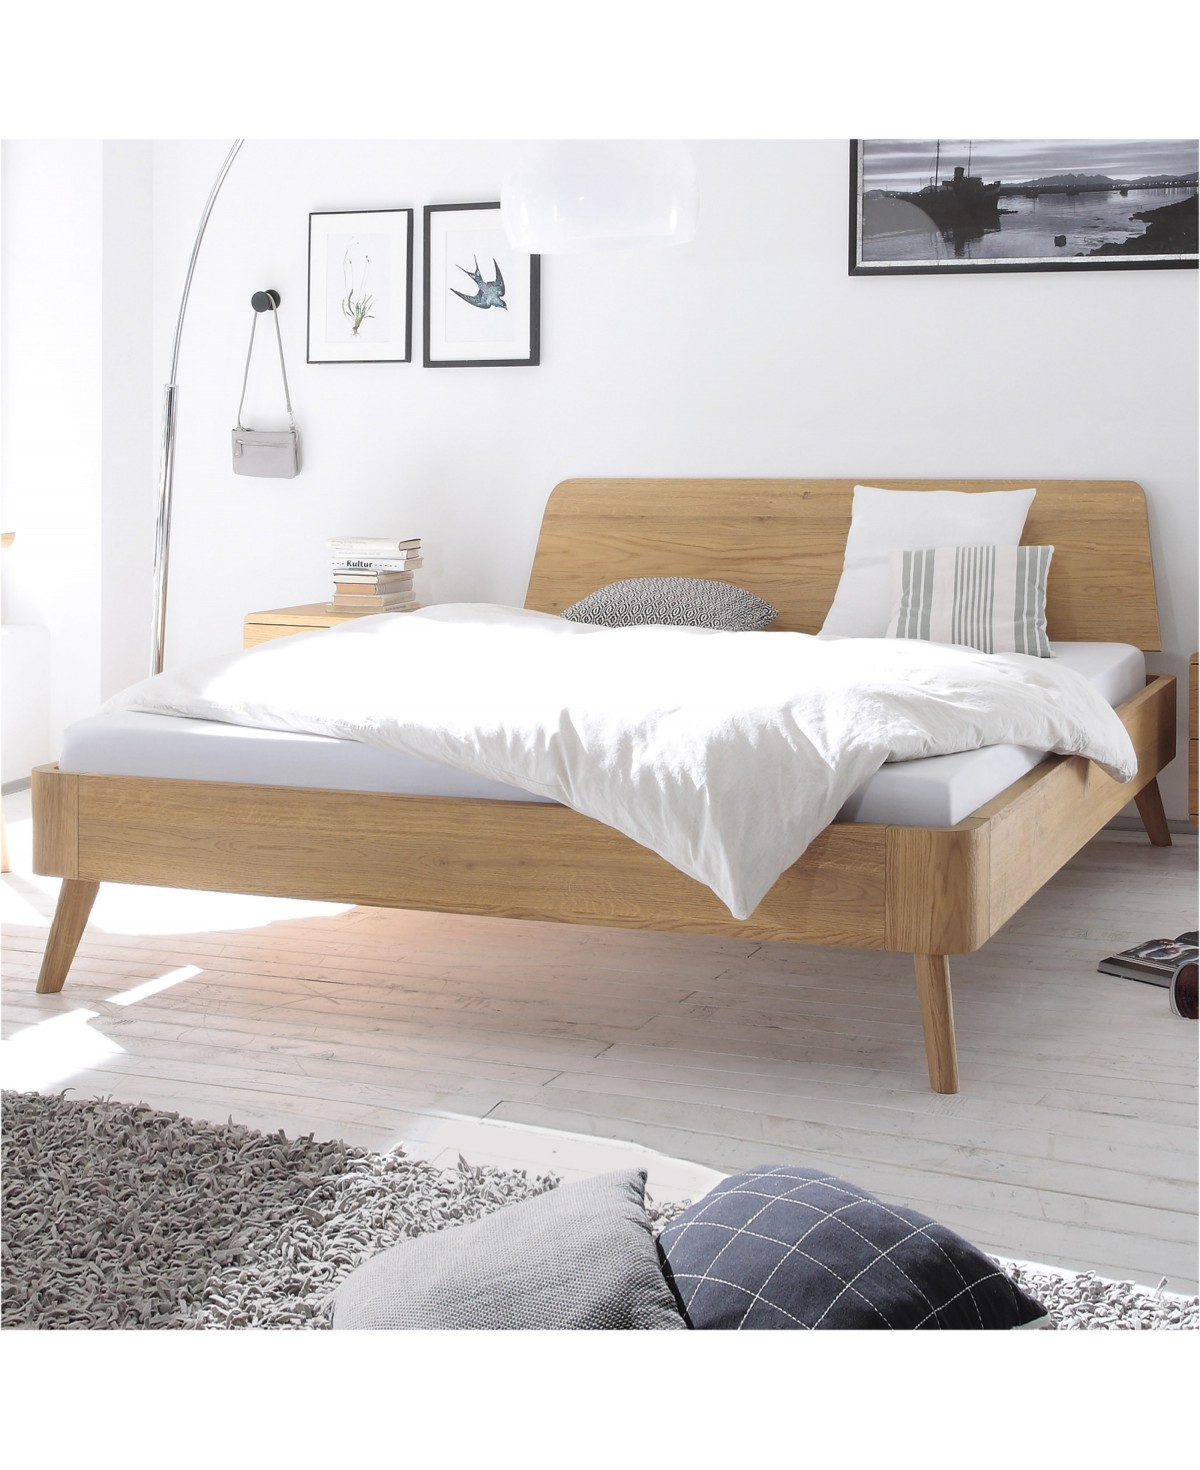 Full Size of Hasena Oak Bianco Eiche Bett Masito 25 Kopfteil Edda 120x200 Mit Unterbett Metall Weiß Wohnwert Betten Baza 160x200 Lattenrost Und Matratze Dormiente Bett Bett 120x200